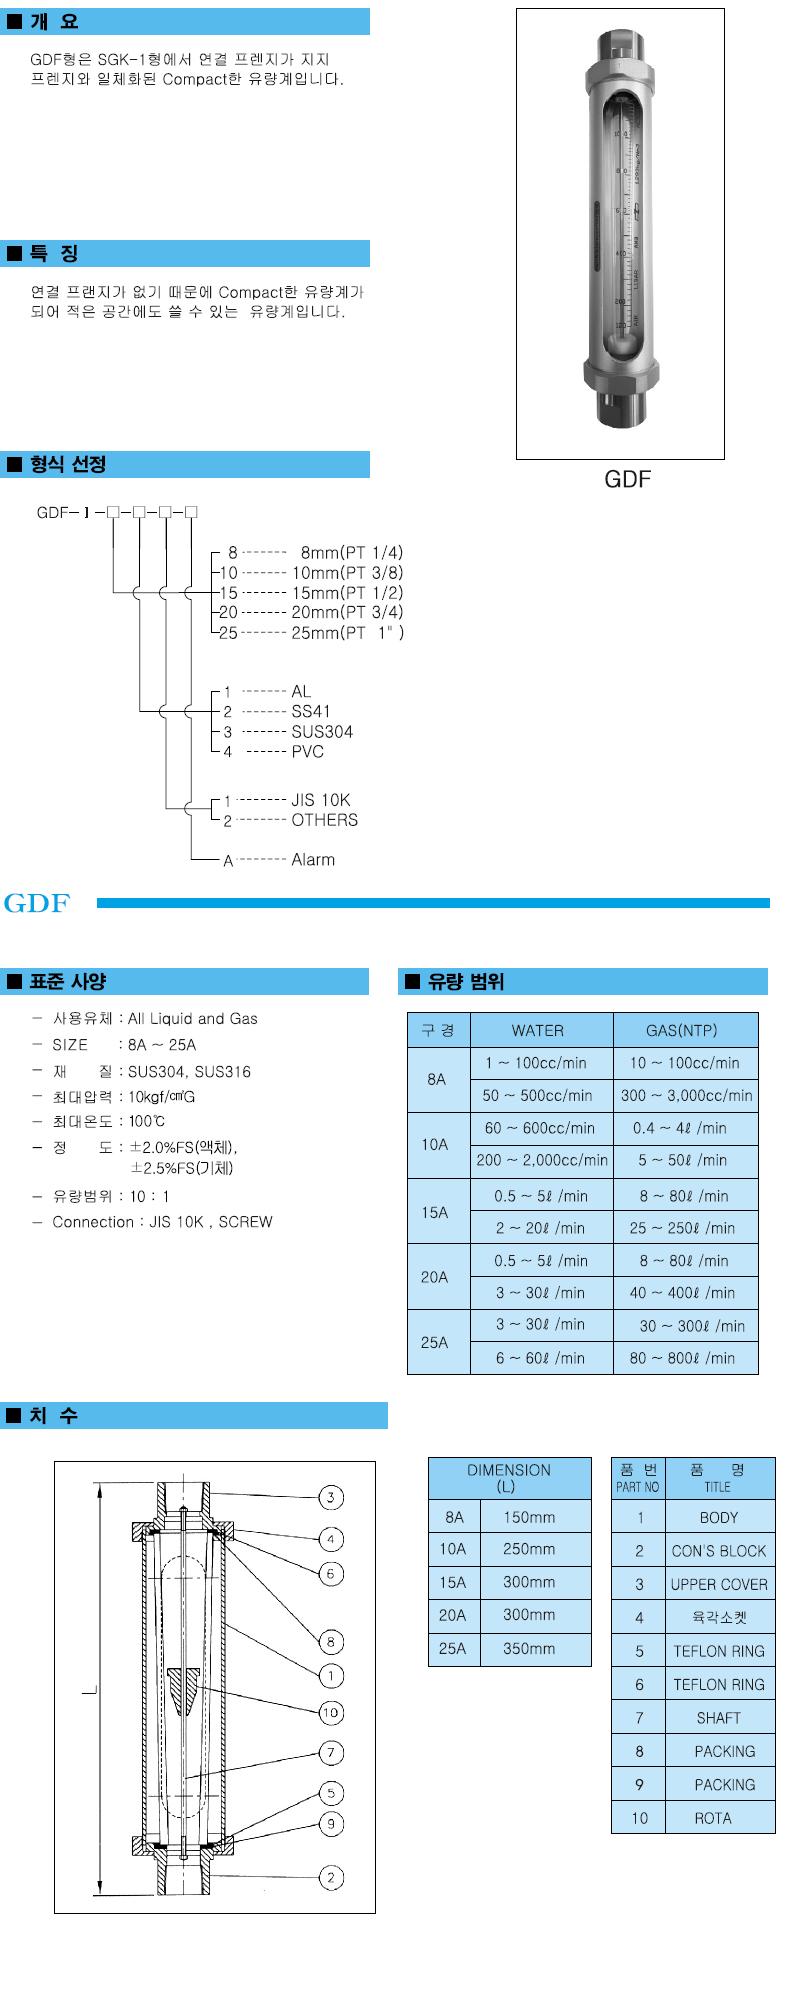 gdf_01.jpg